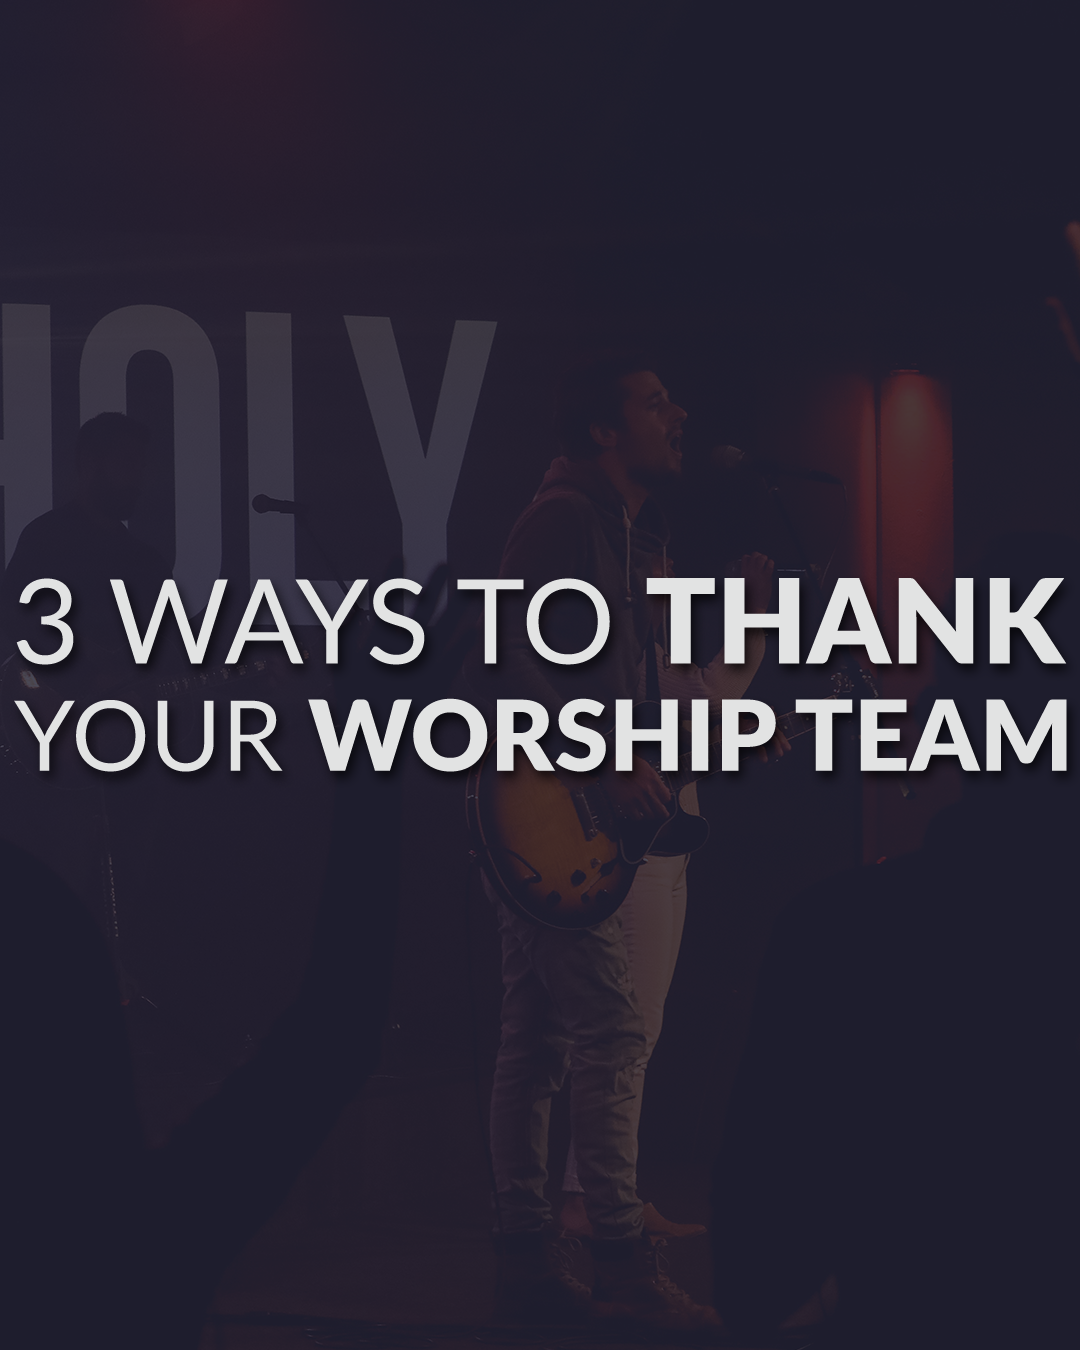 3 Ways To Thank Your Worship Team